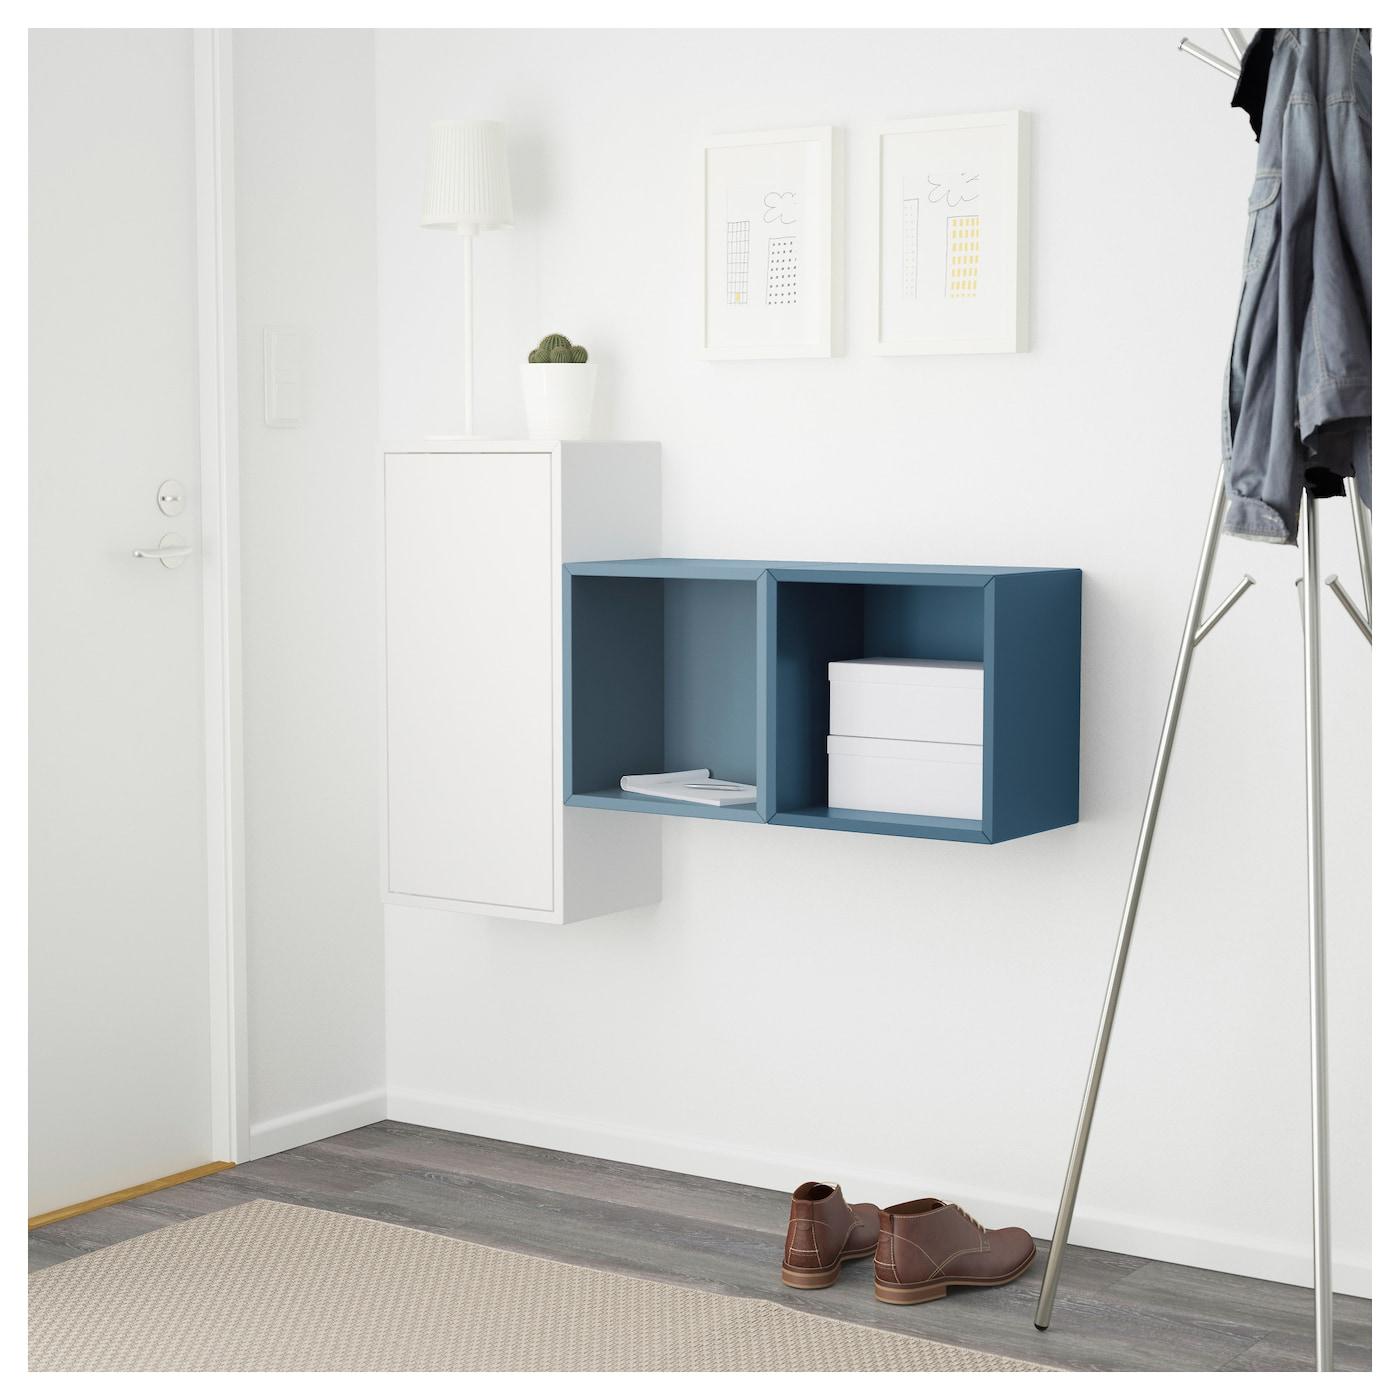 Eket Wall Mounted Cabinet Combination White Light Blue Dark Blue 105x25x70 Cm Ikea